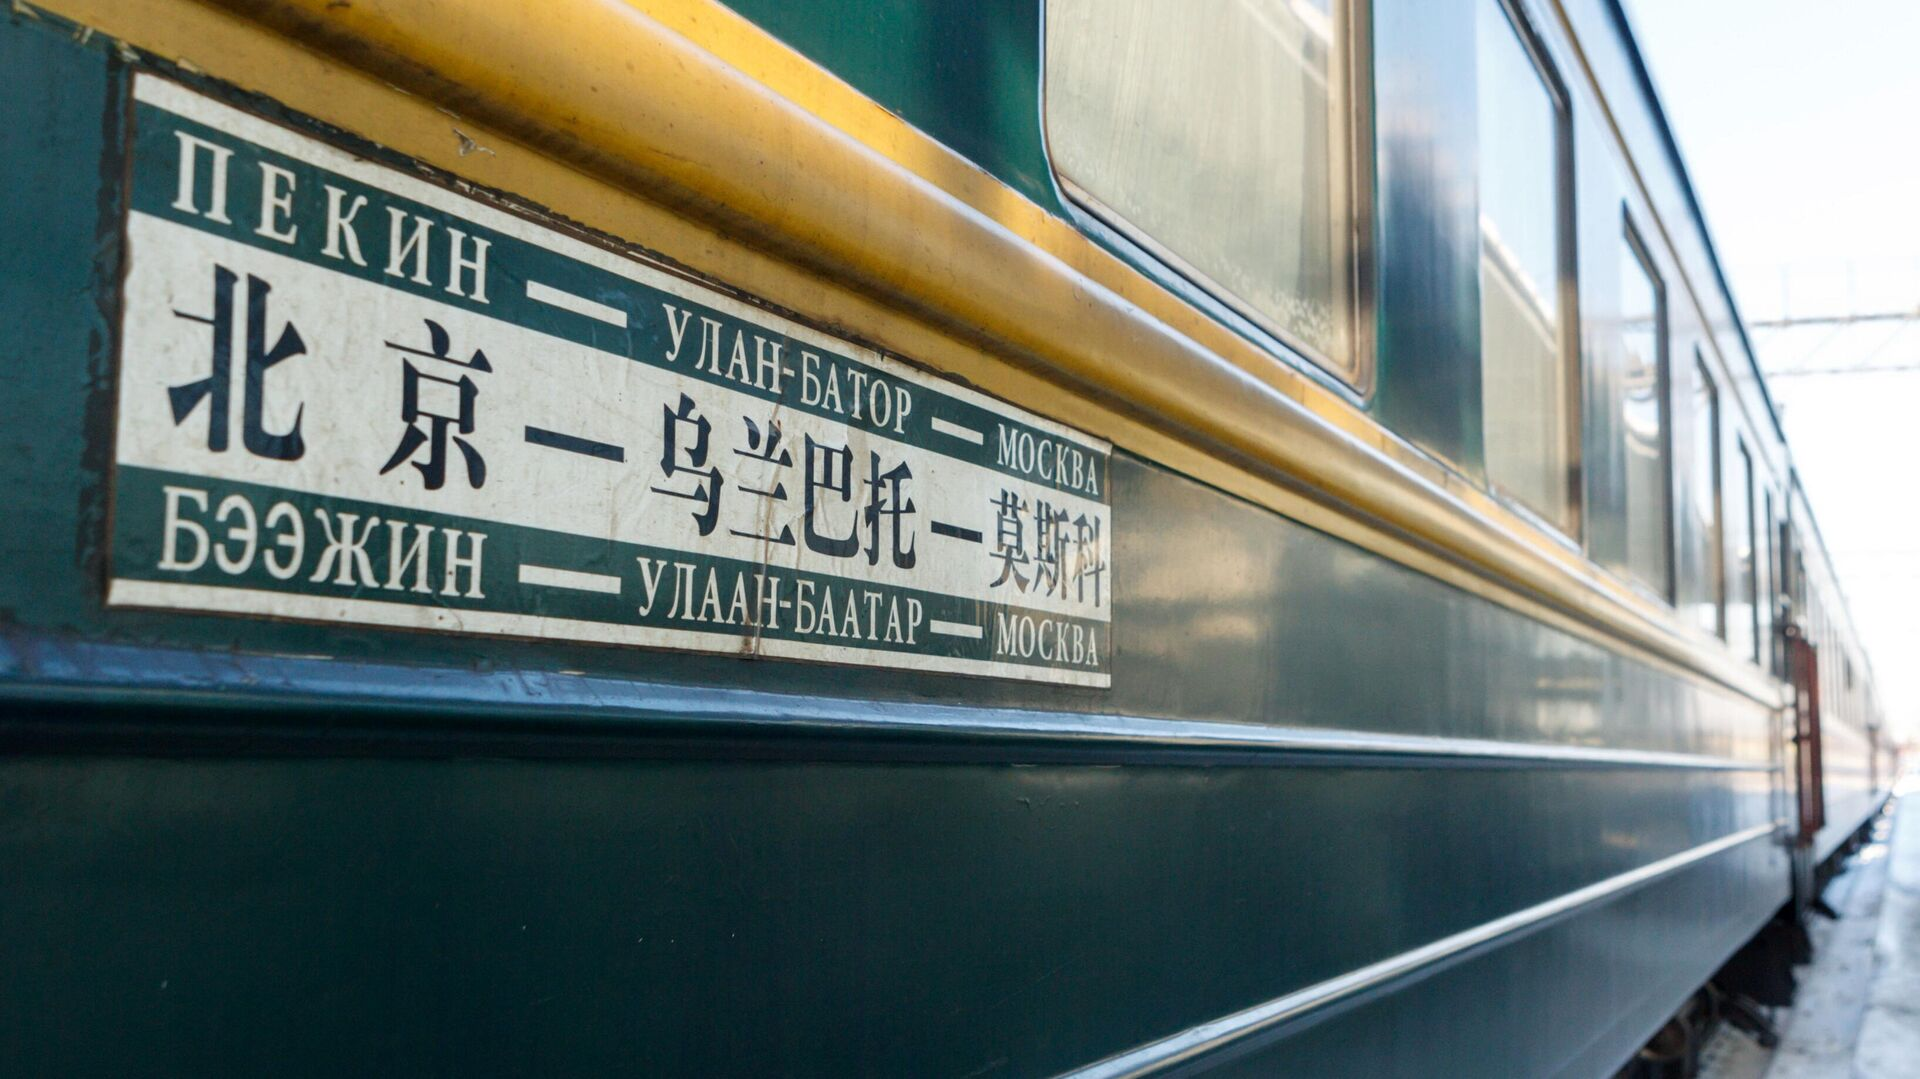 Un tren de Rusia a China (imagen referencial) - Sputnik Mundo, 1920, 14.07.2021